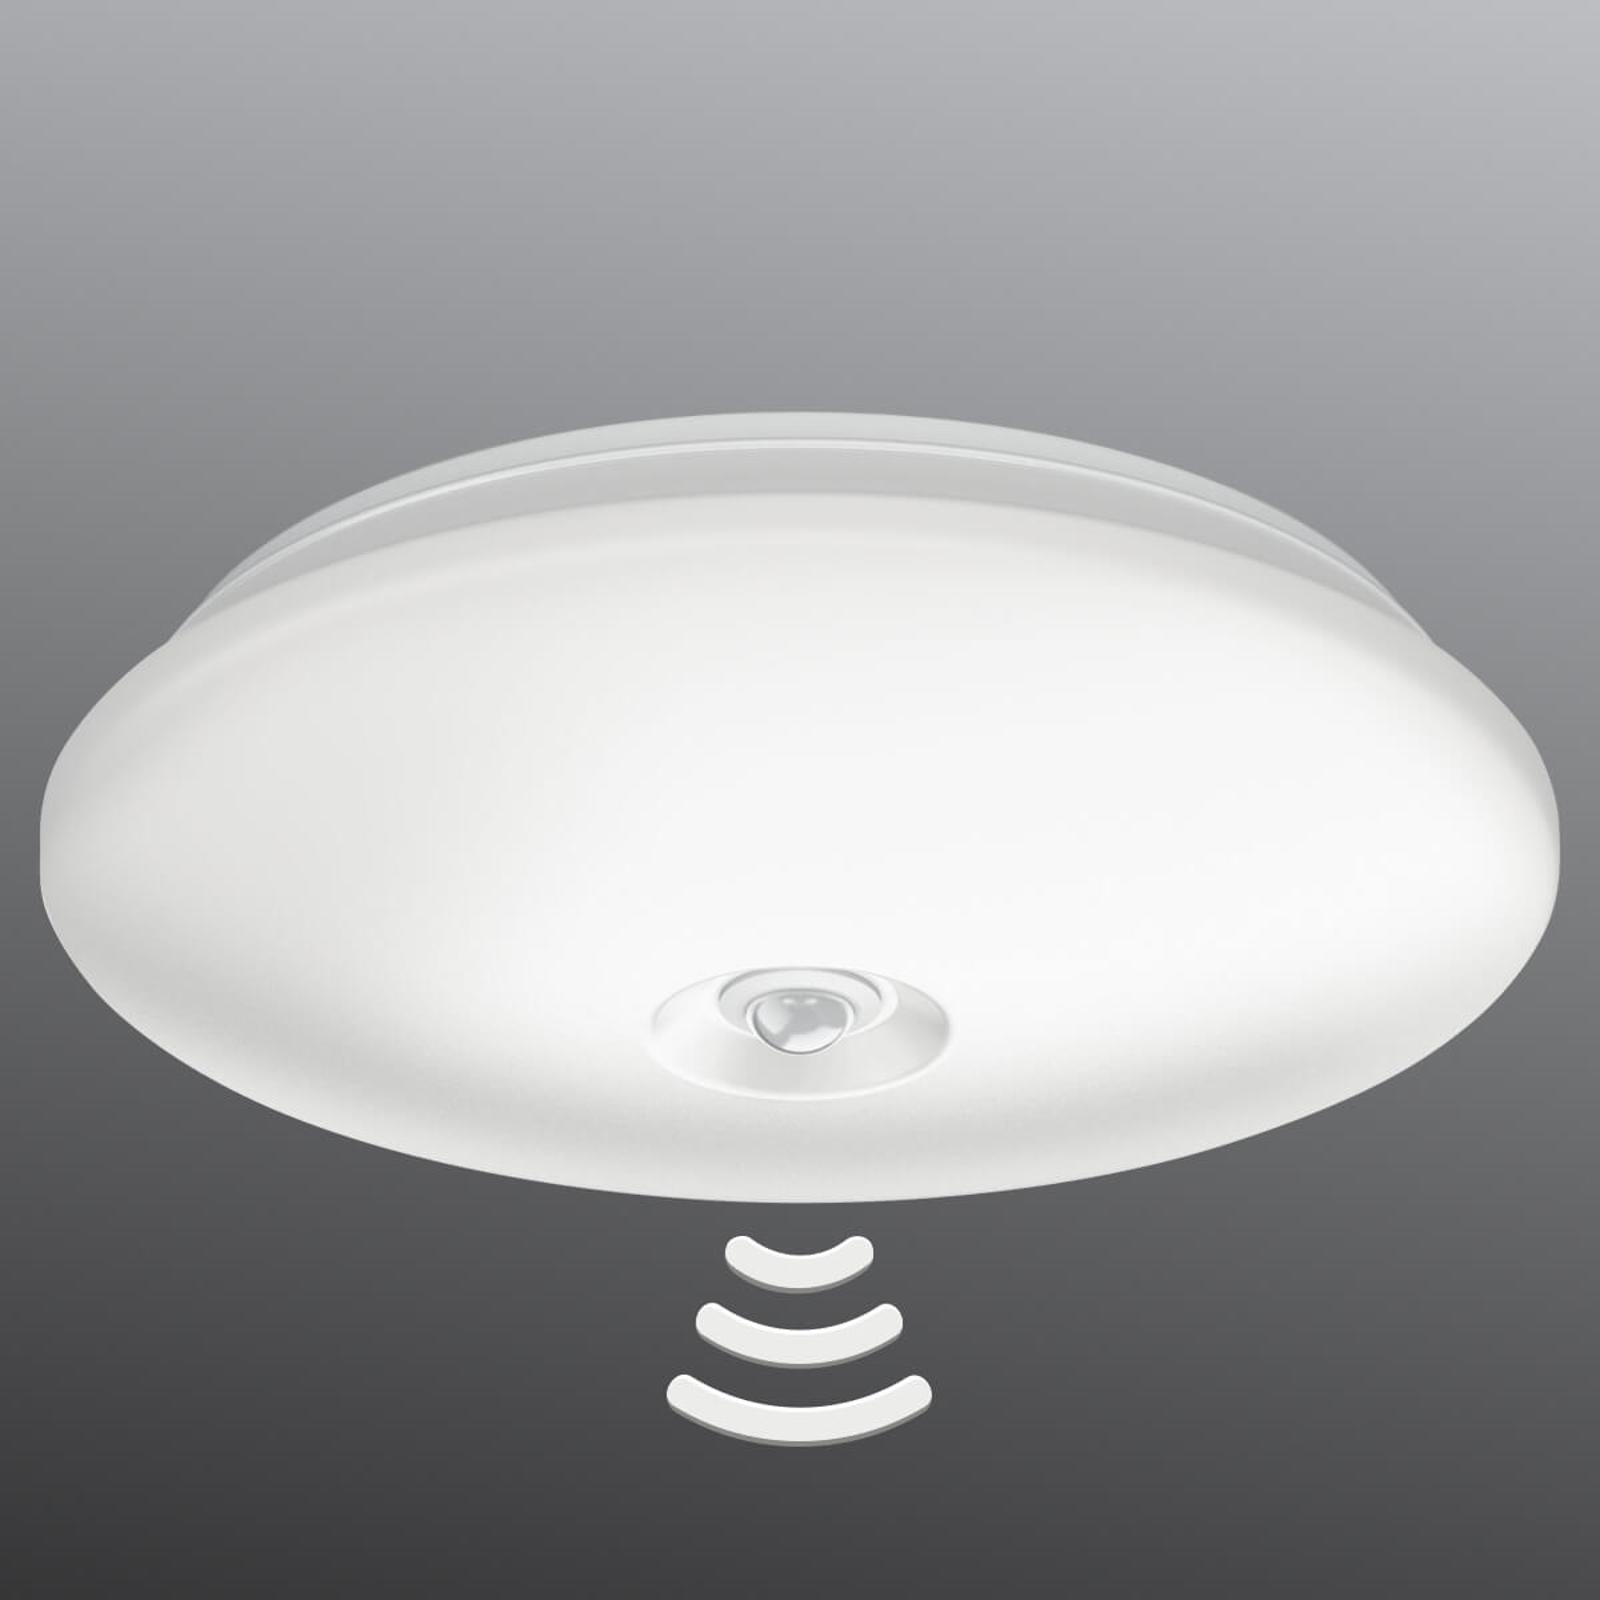 LED plafondlamp Mauve met IR-sensor, Ø 32 cm